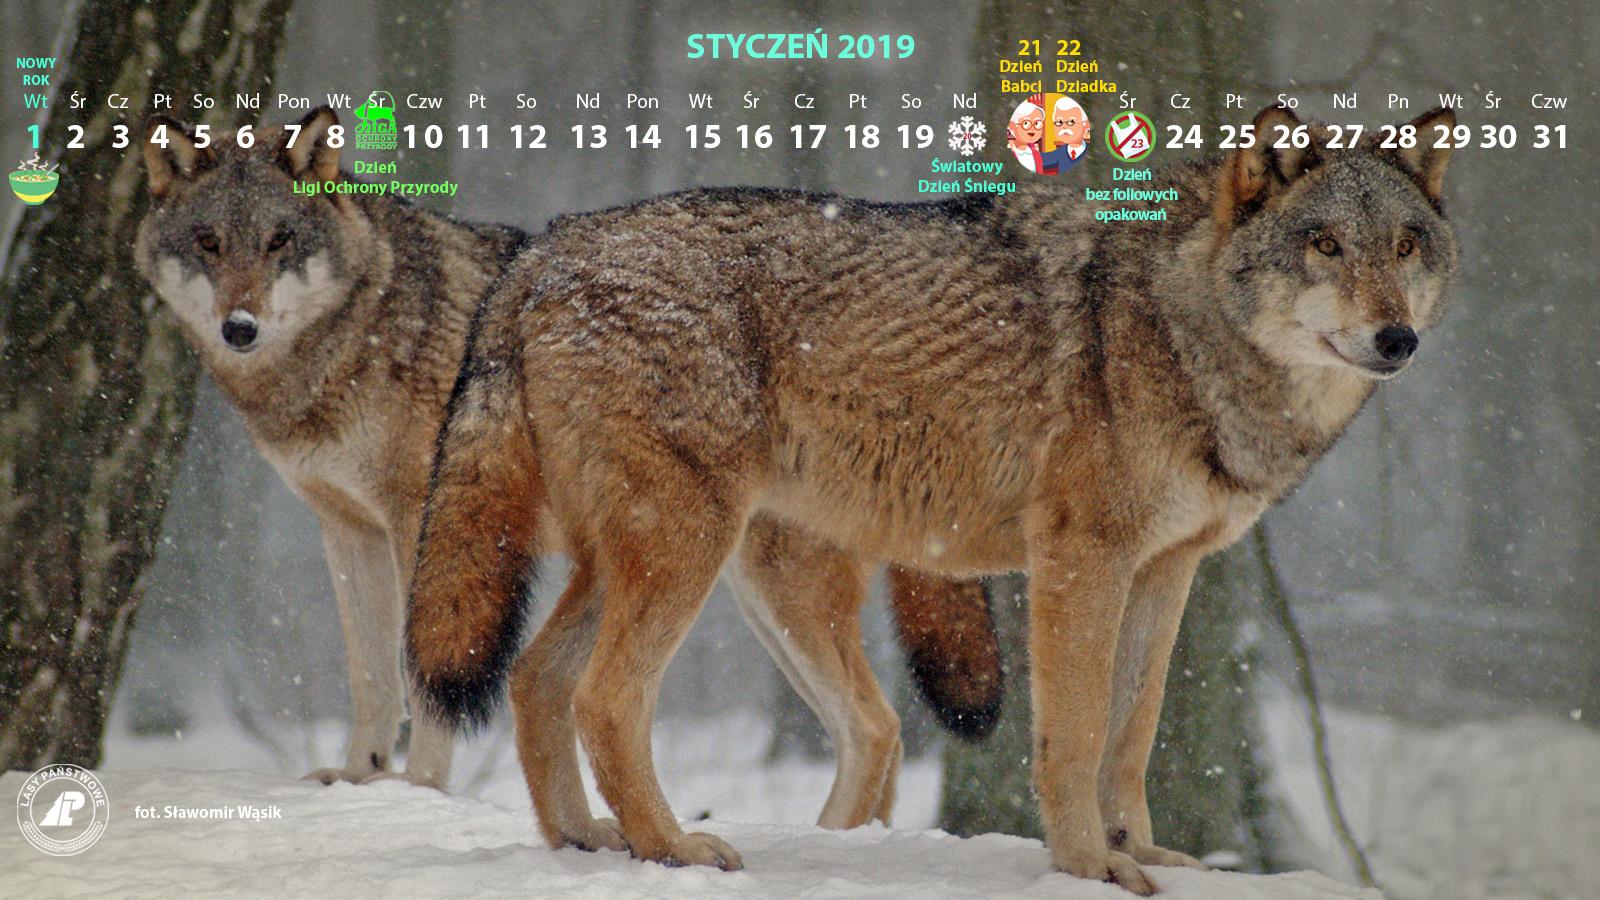 Kalendarz_styczeń_2019_1600x900[1].jpg